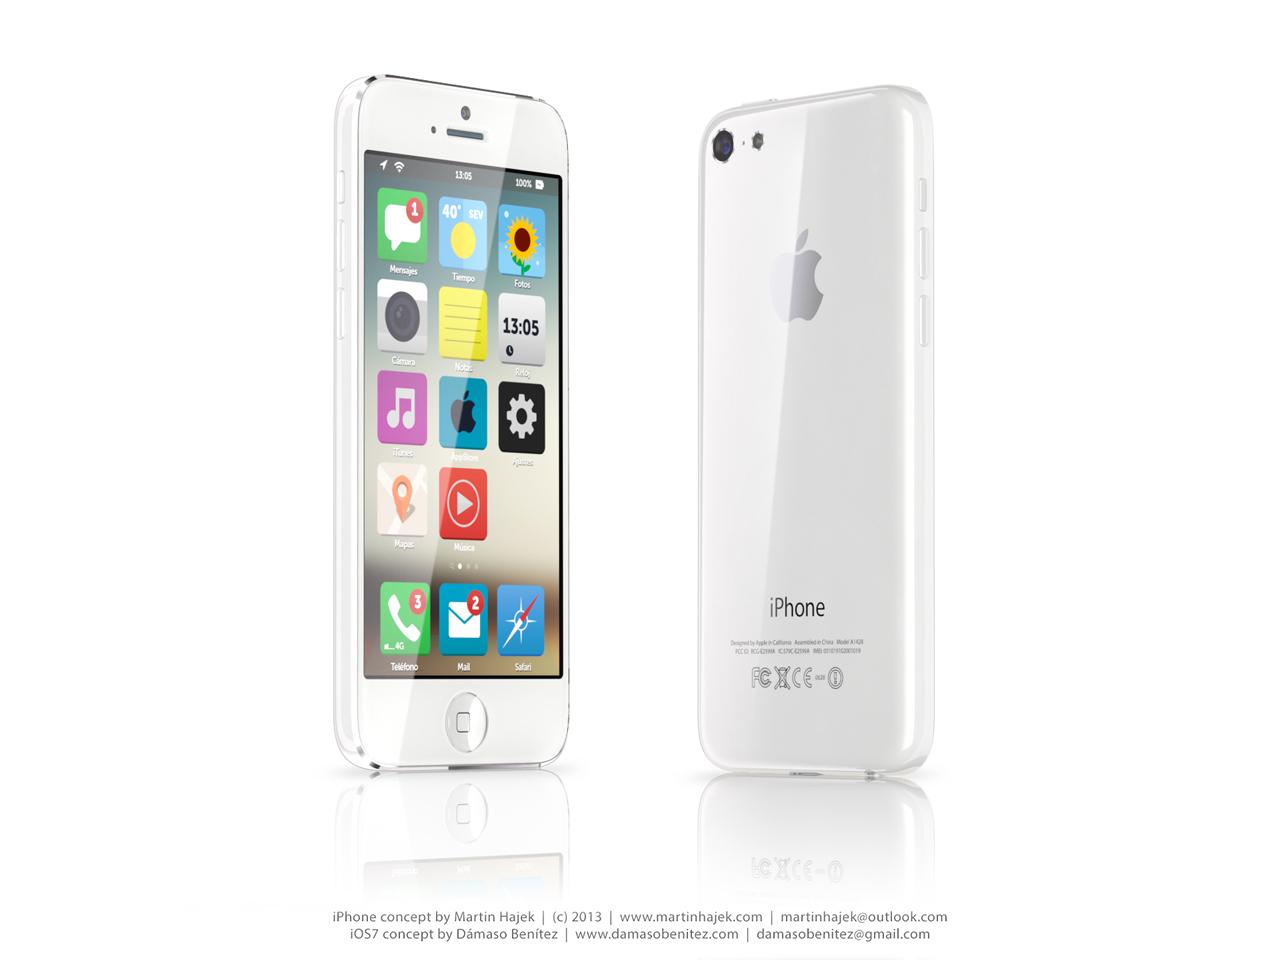 Budget iPhone concept (iOS 7, Martin Hajek 005)